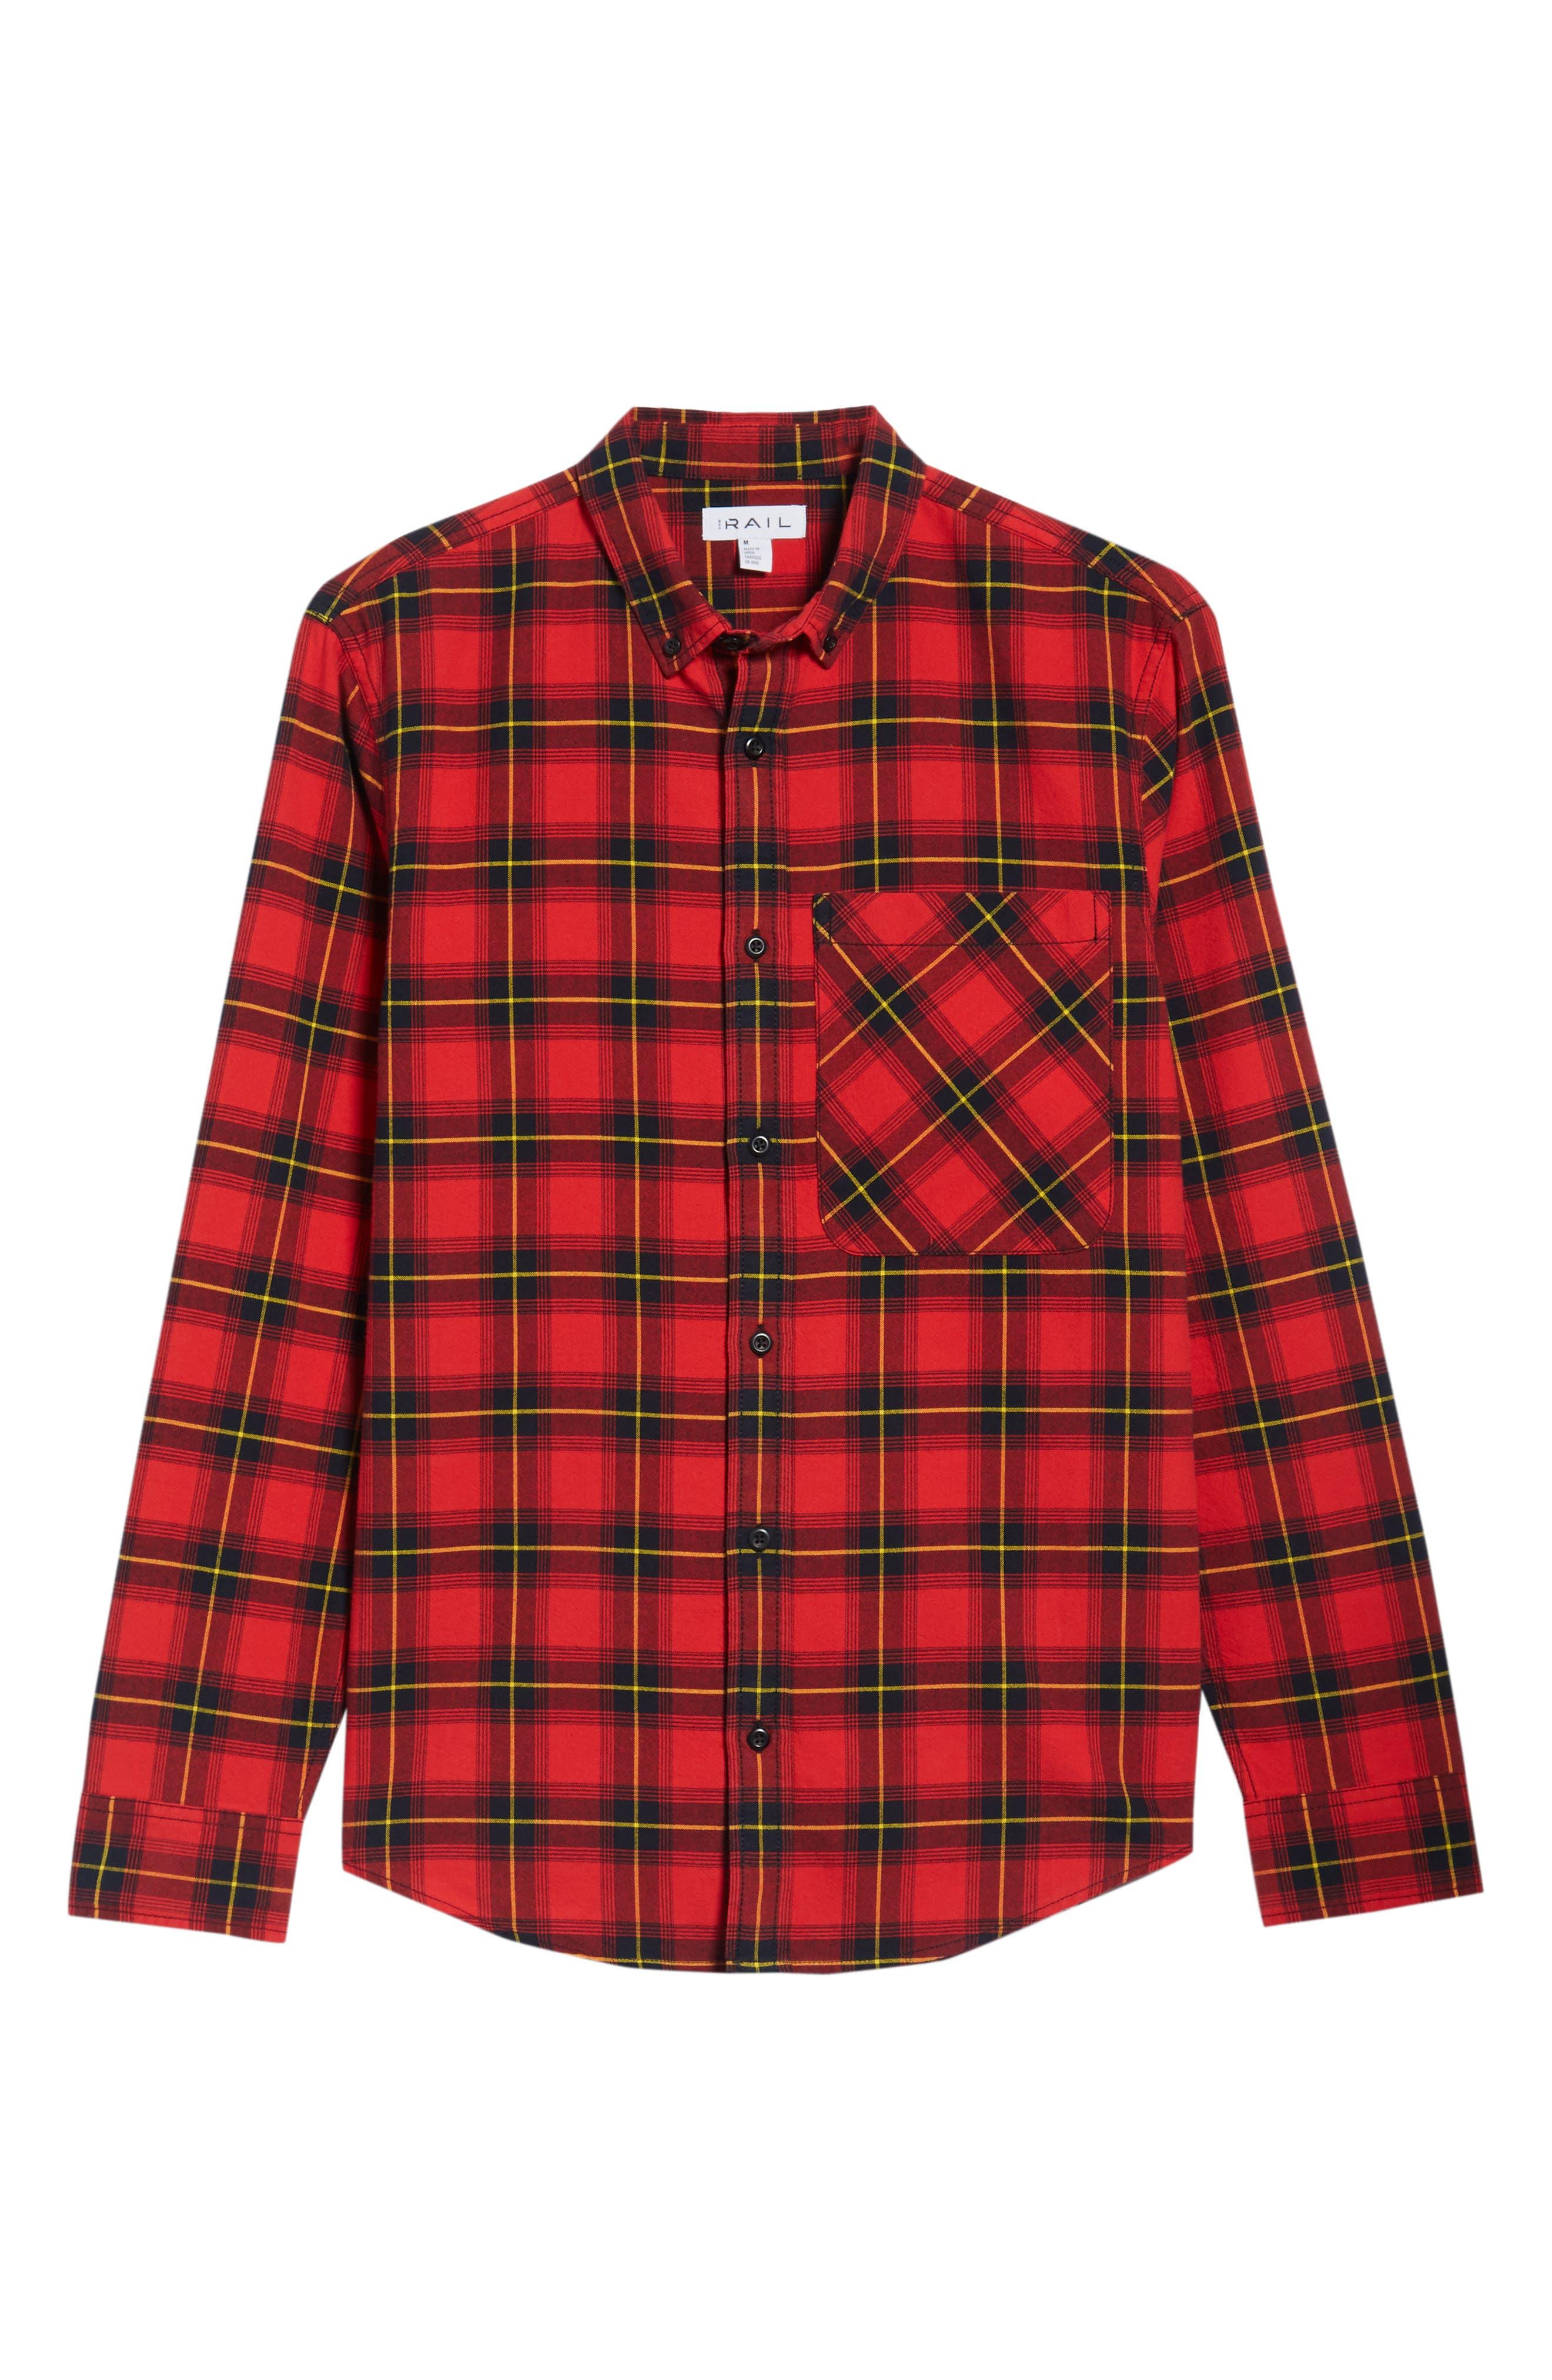 Plaid Oversize Pocket Sport Shirt,                             Alternate thumbnail 6, color,                             610